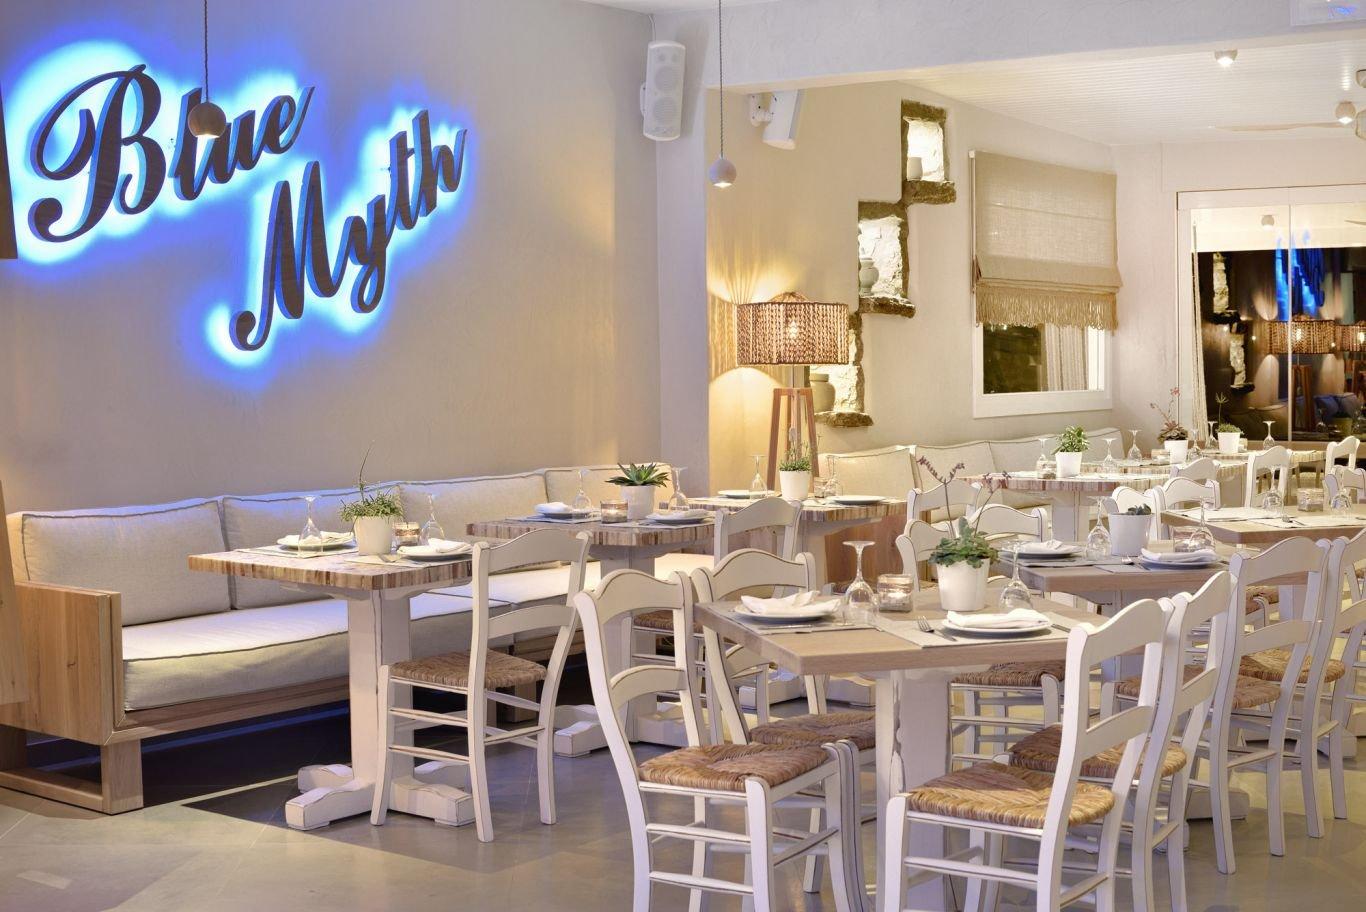 Petinos hotel - restaurant